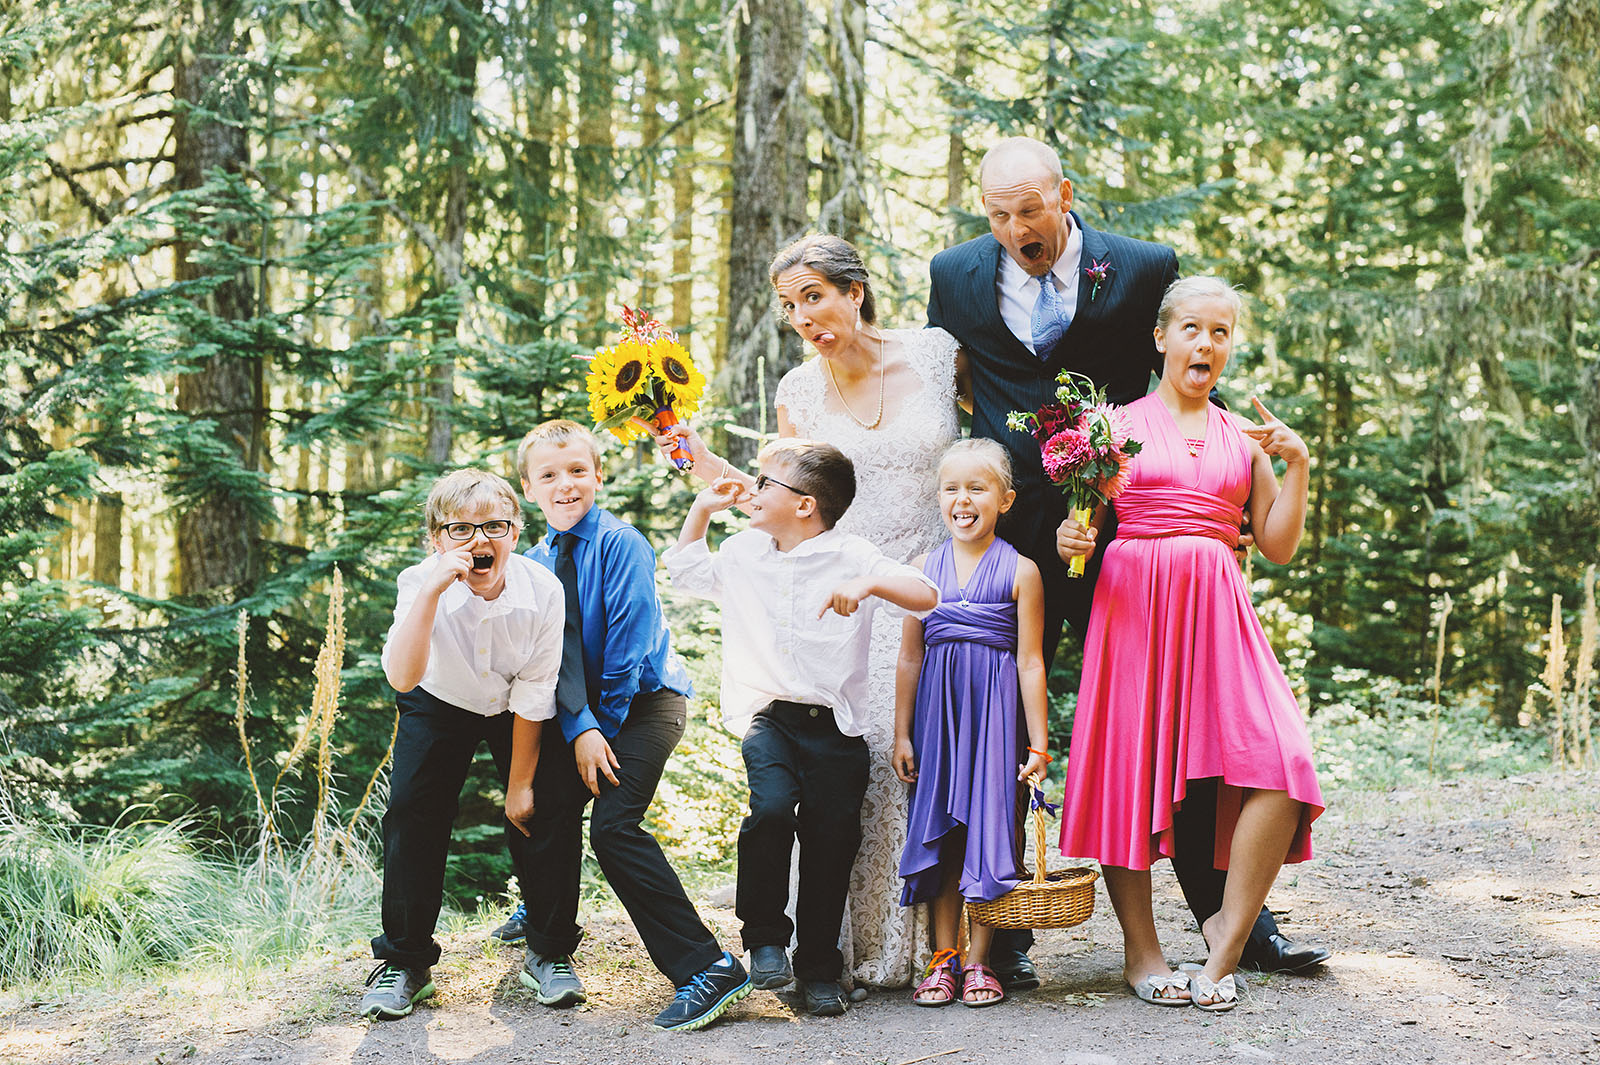 Family photos gone silly | Mazama Lodge Wedding